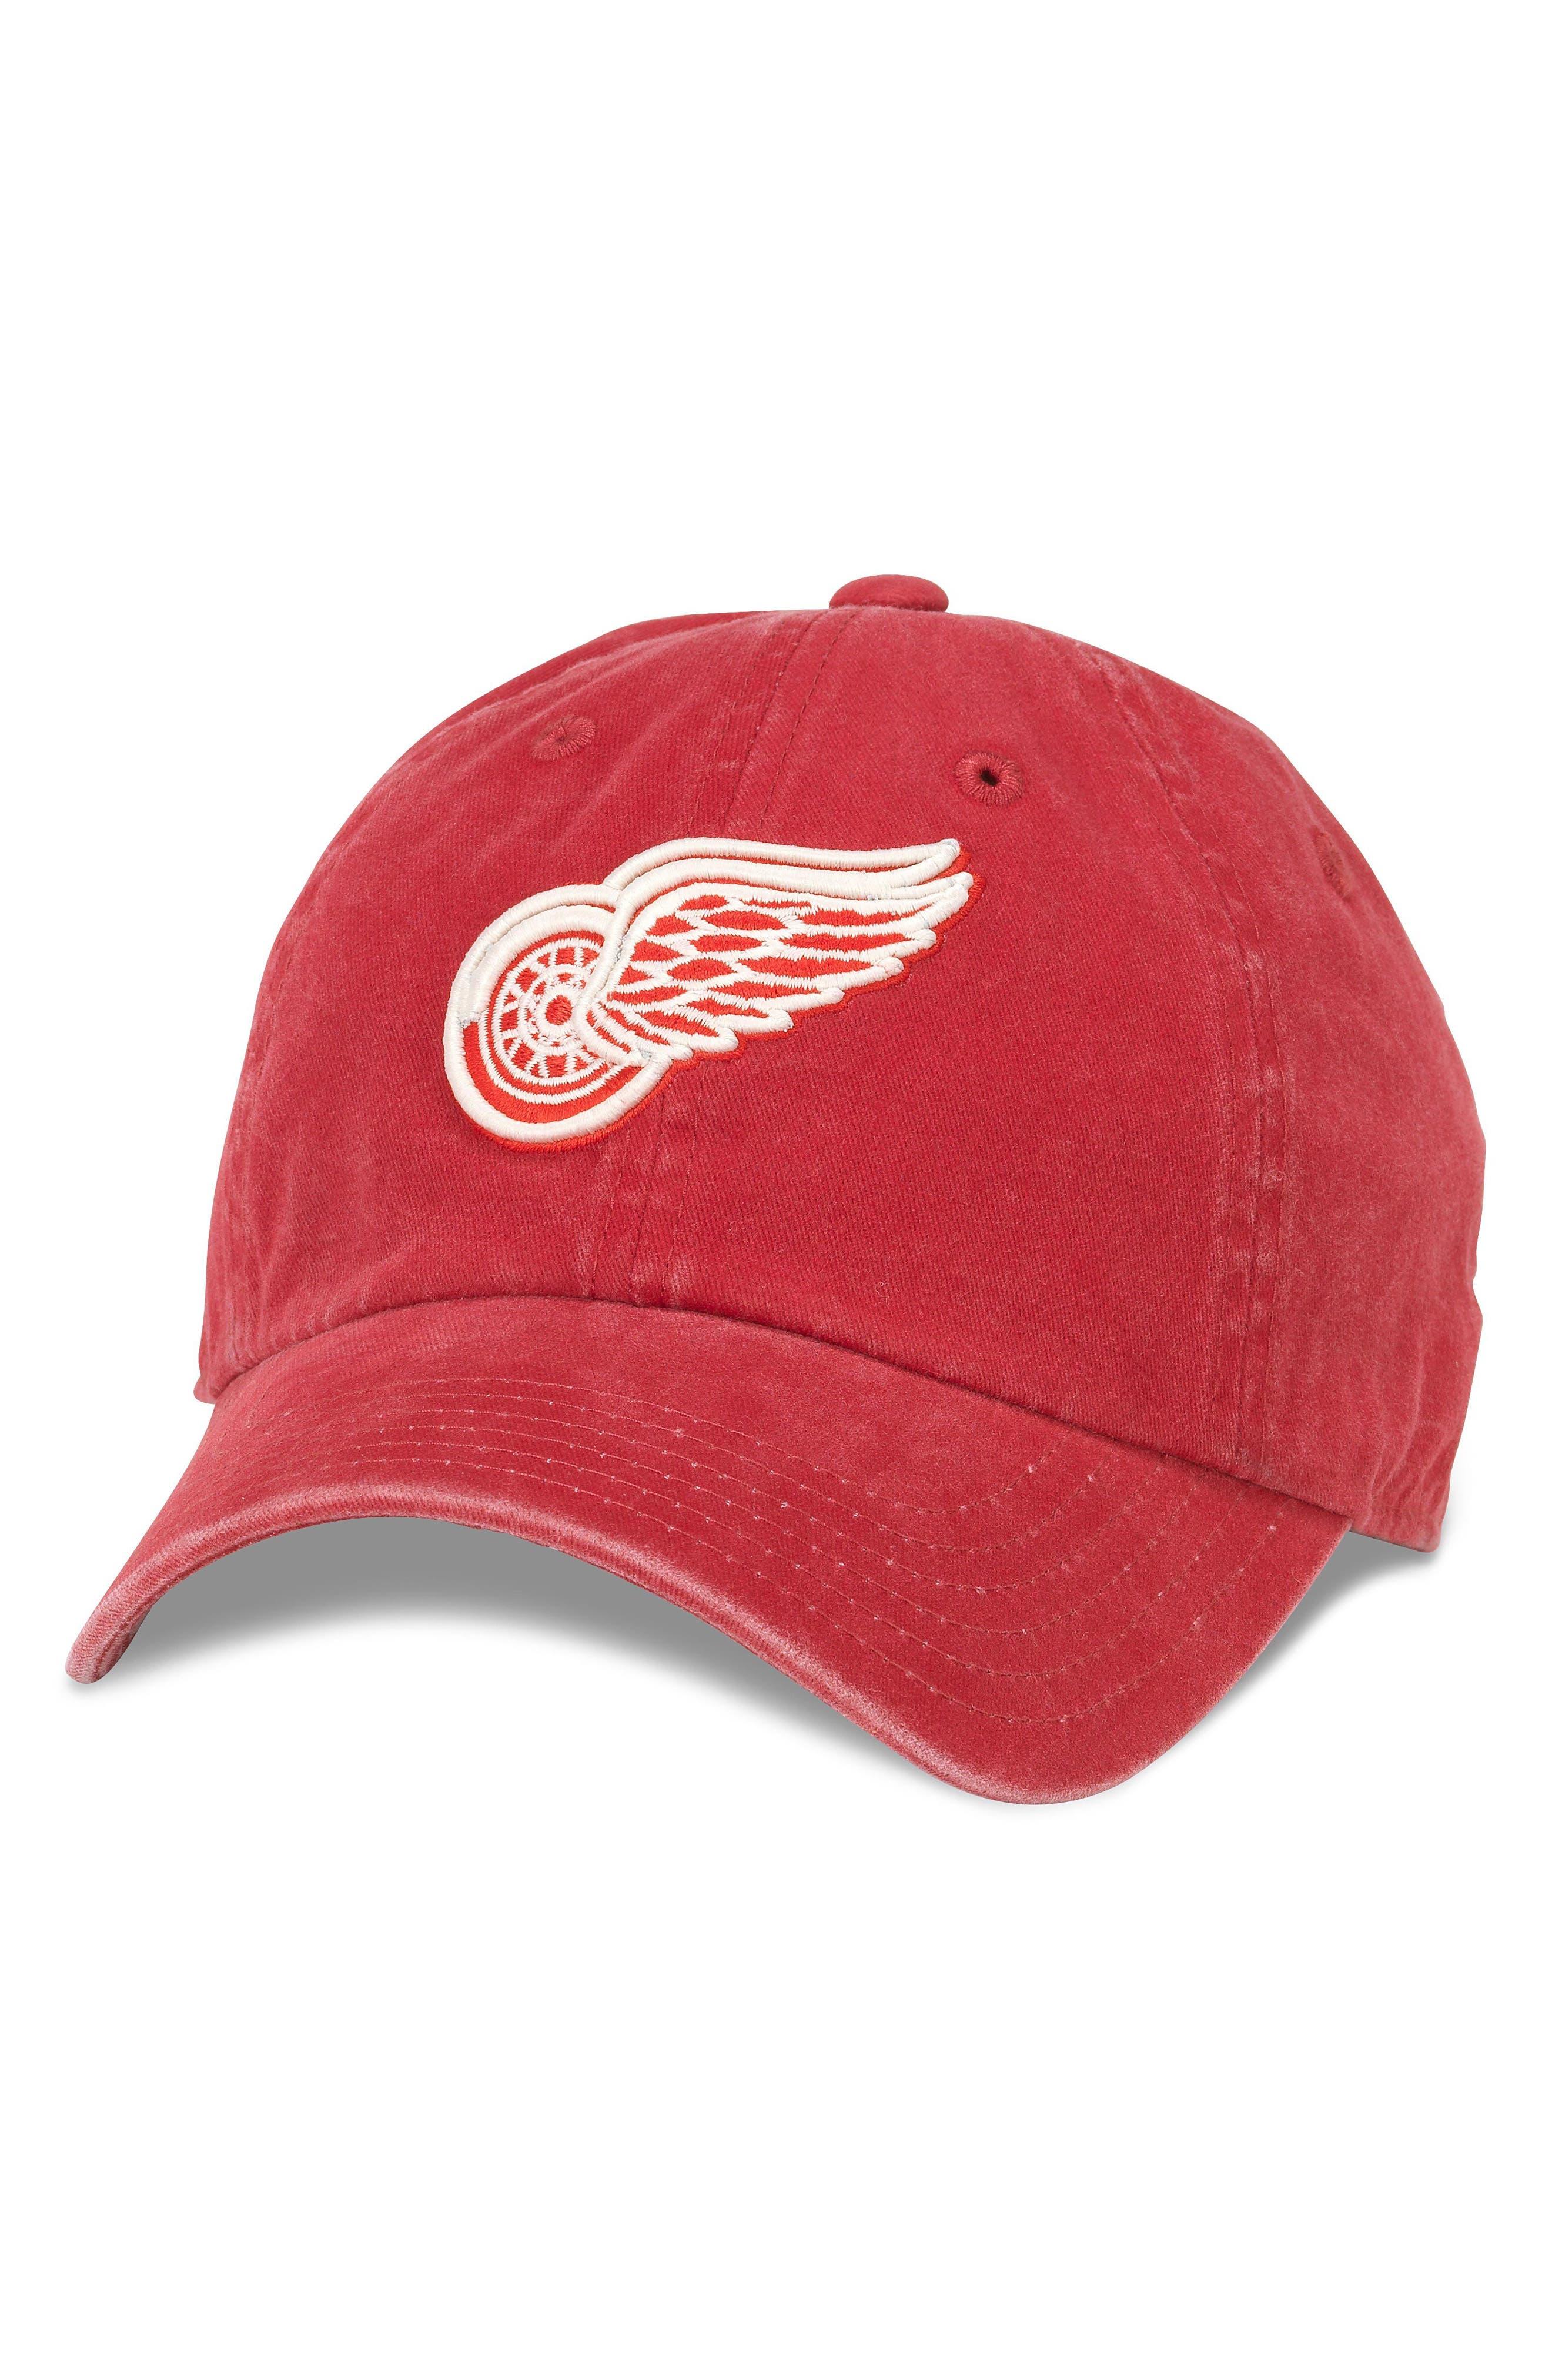 New Raglan NHL Cap,                             Main thumbnail 1, color,                             Red Wings/ Red